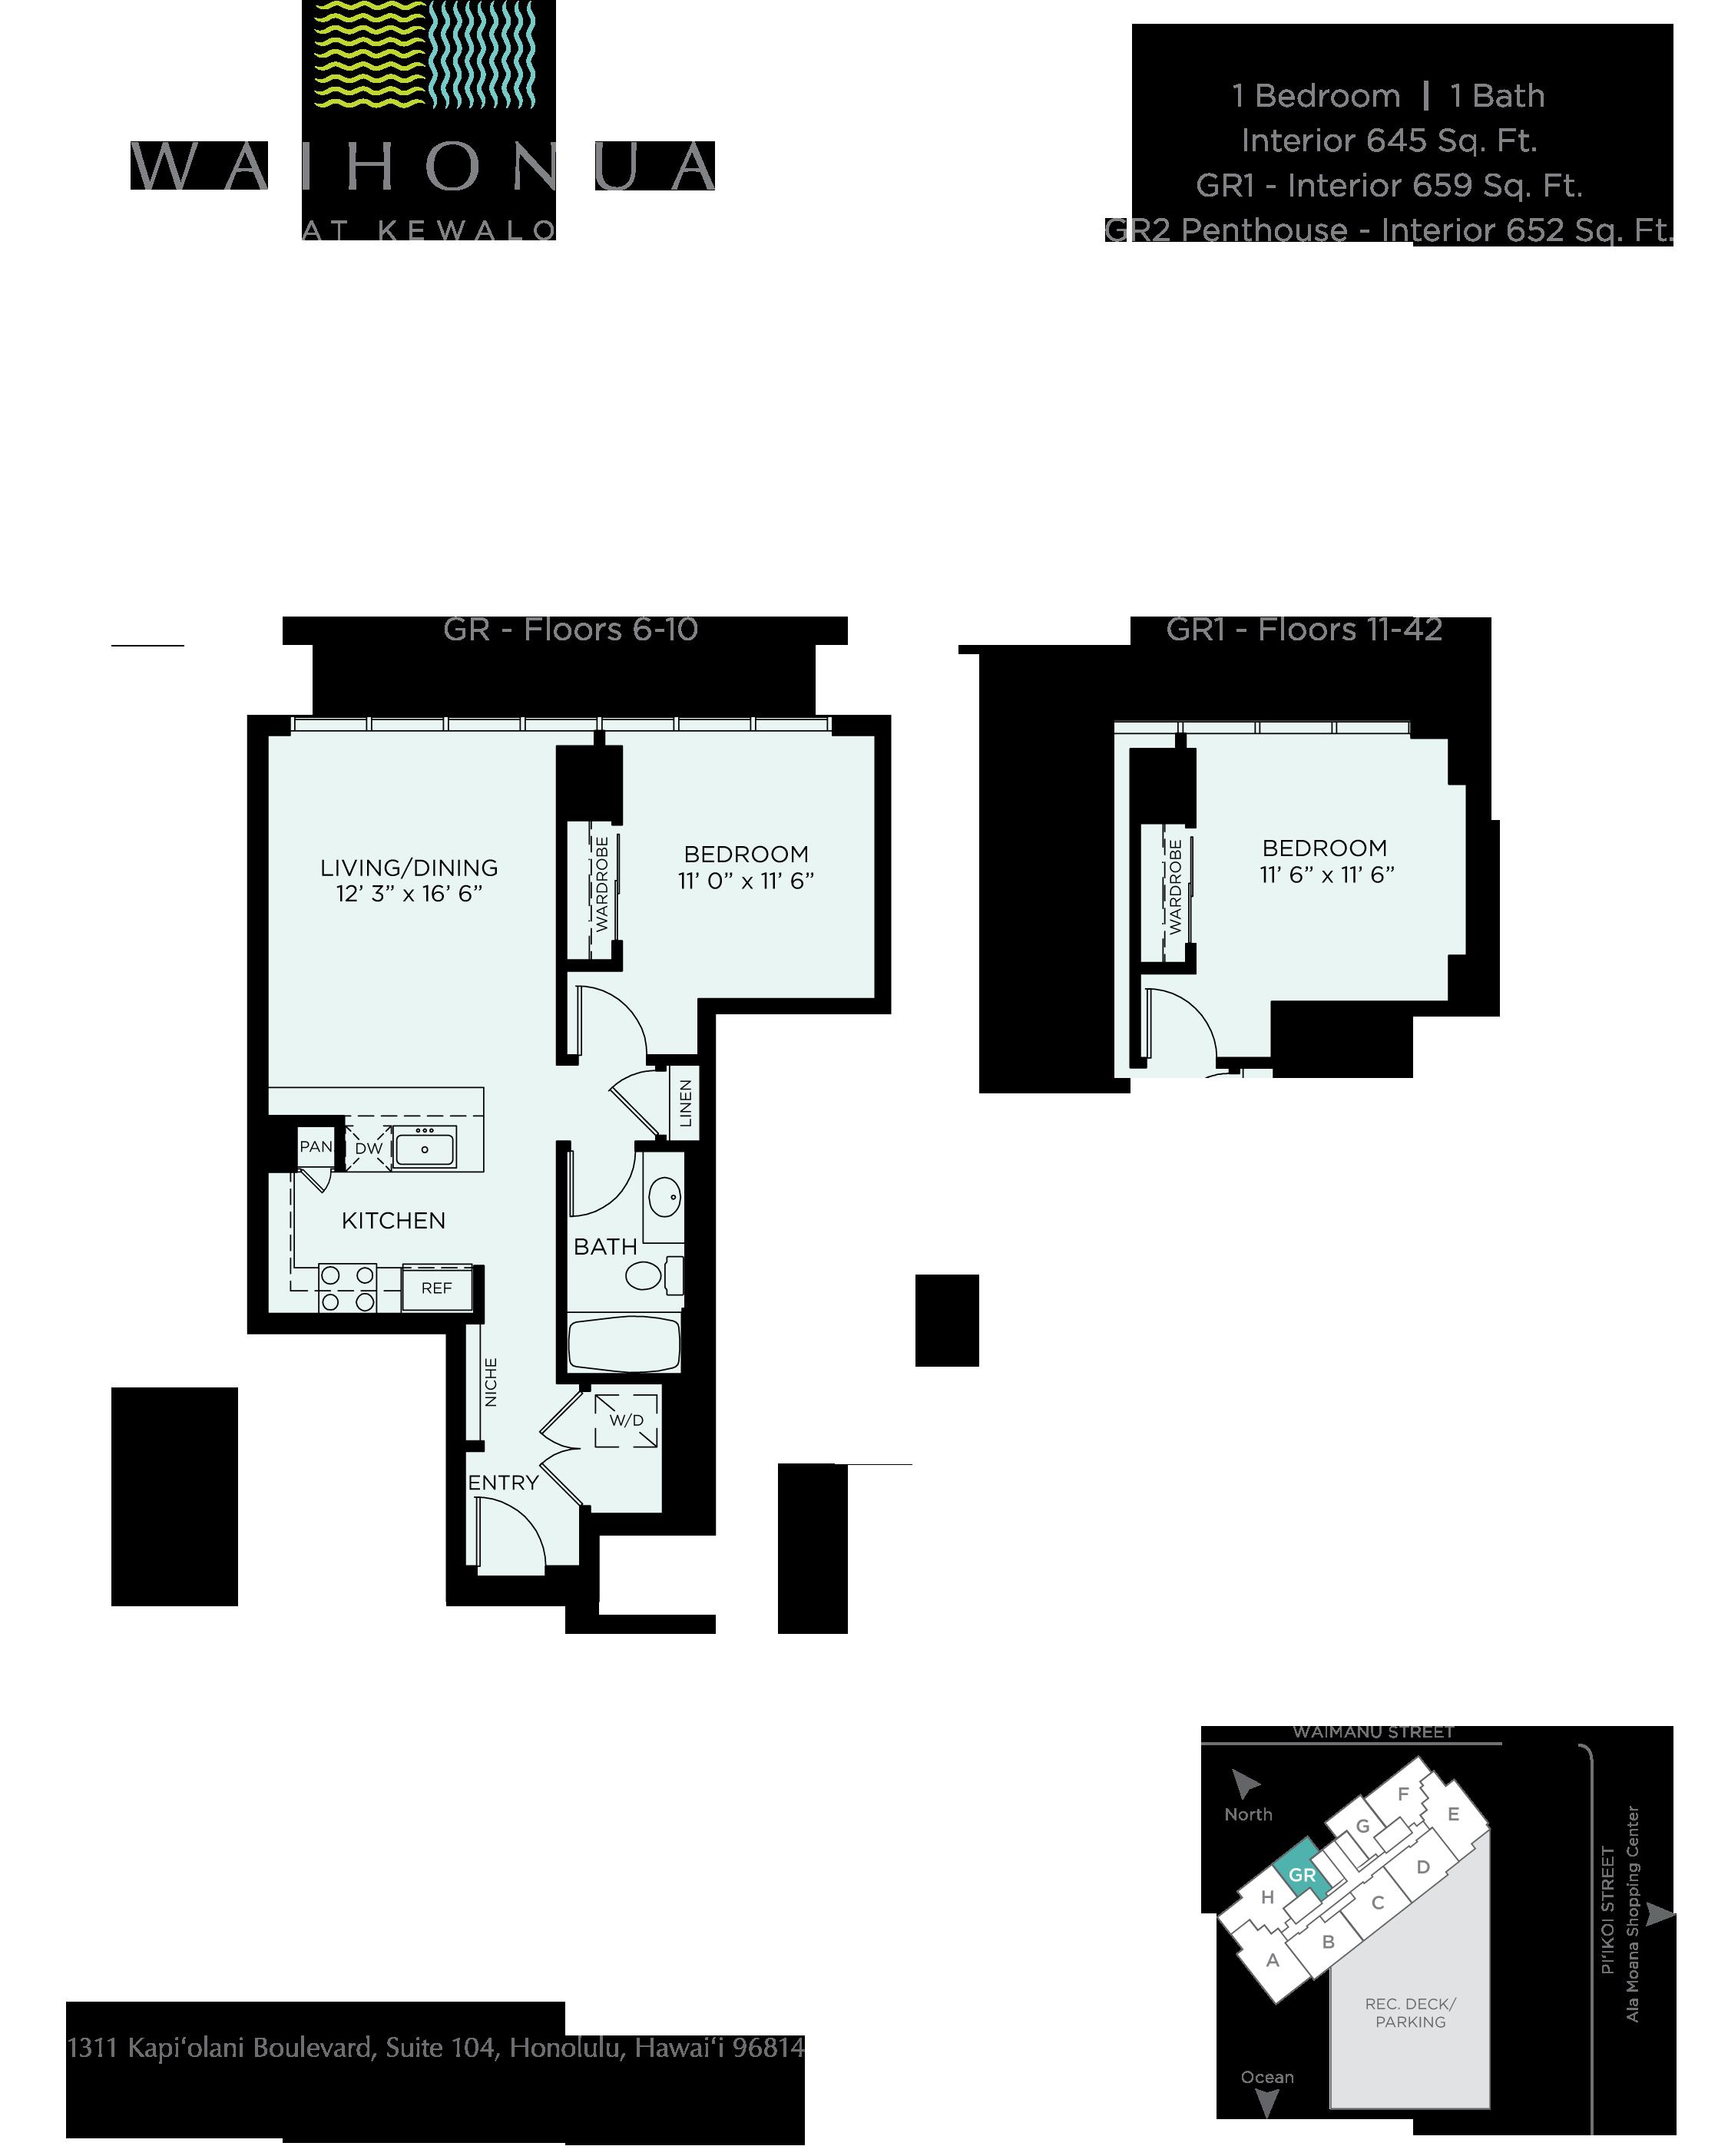 Waihonua Floor Plan GR